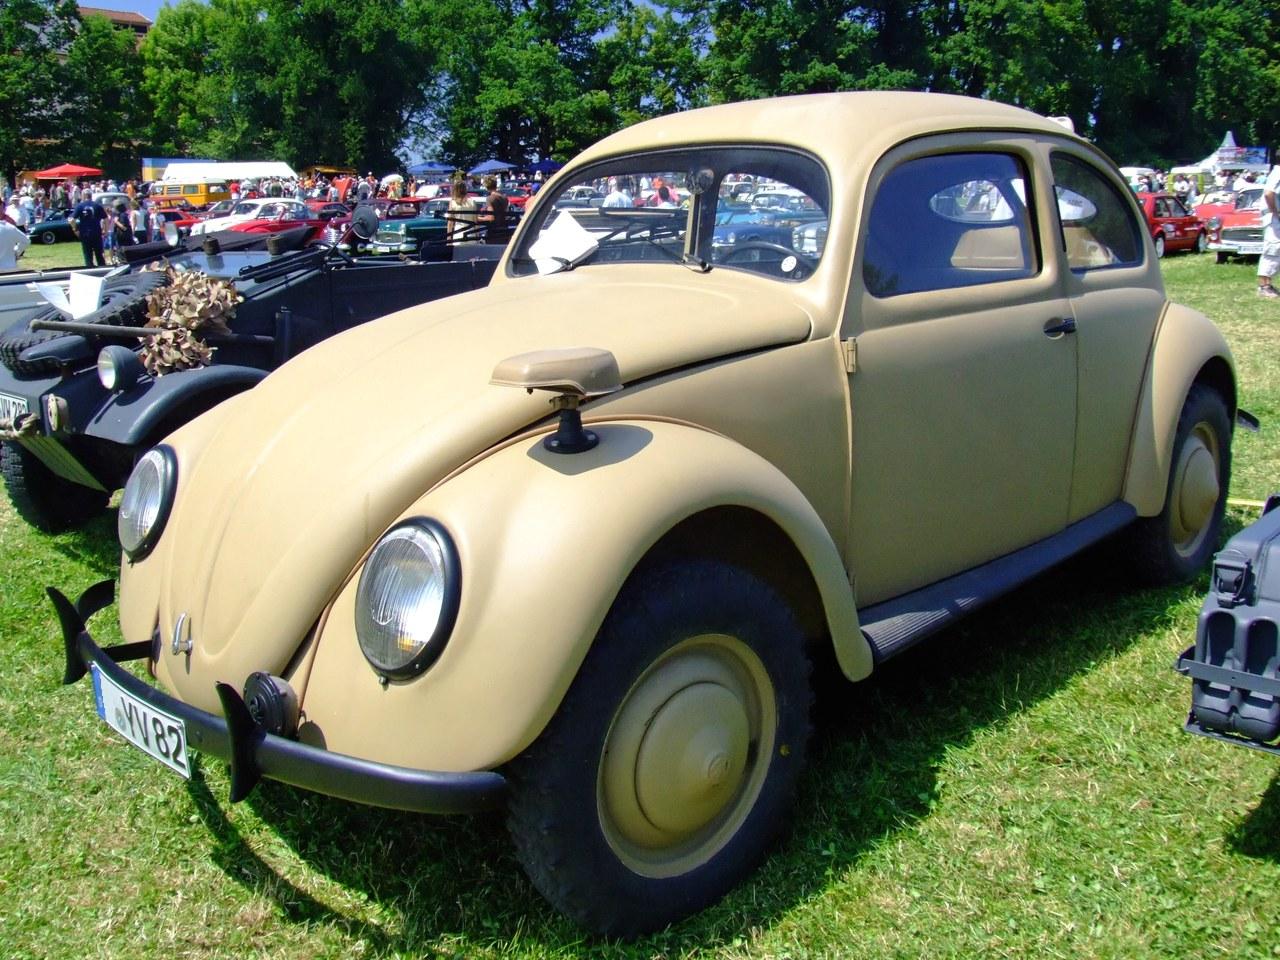 http://upload.wikimedia.org/wikipedia/commons/e/e4/VW_K%C3%A4fer_Typ82_1.jpg